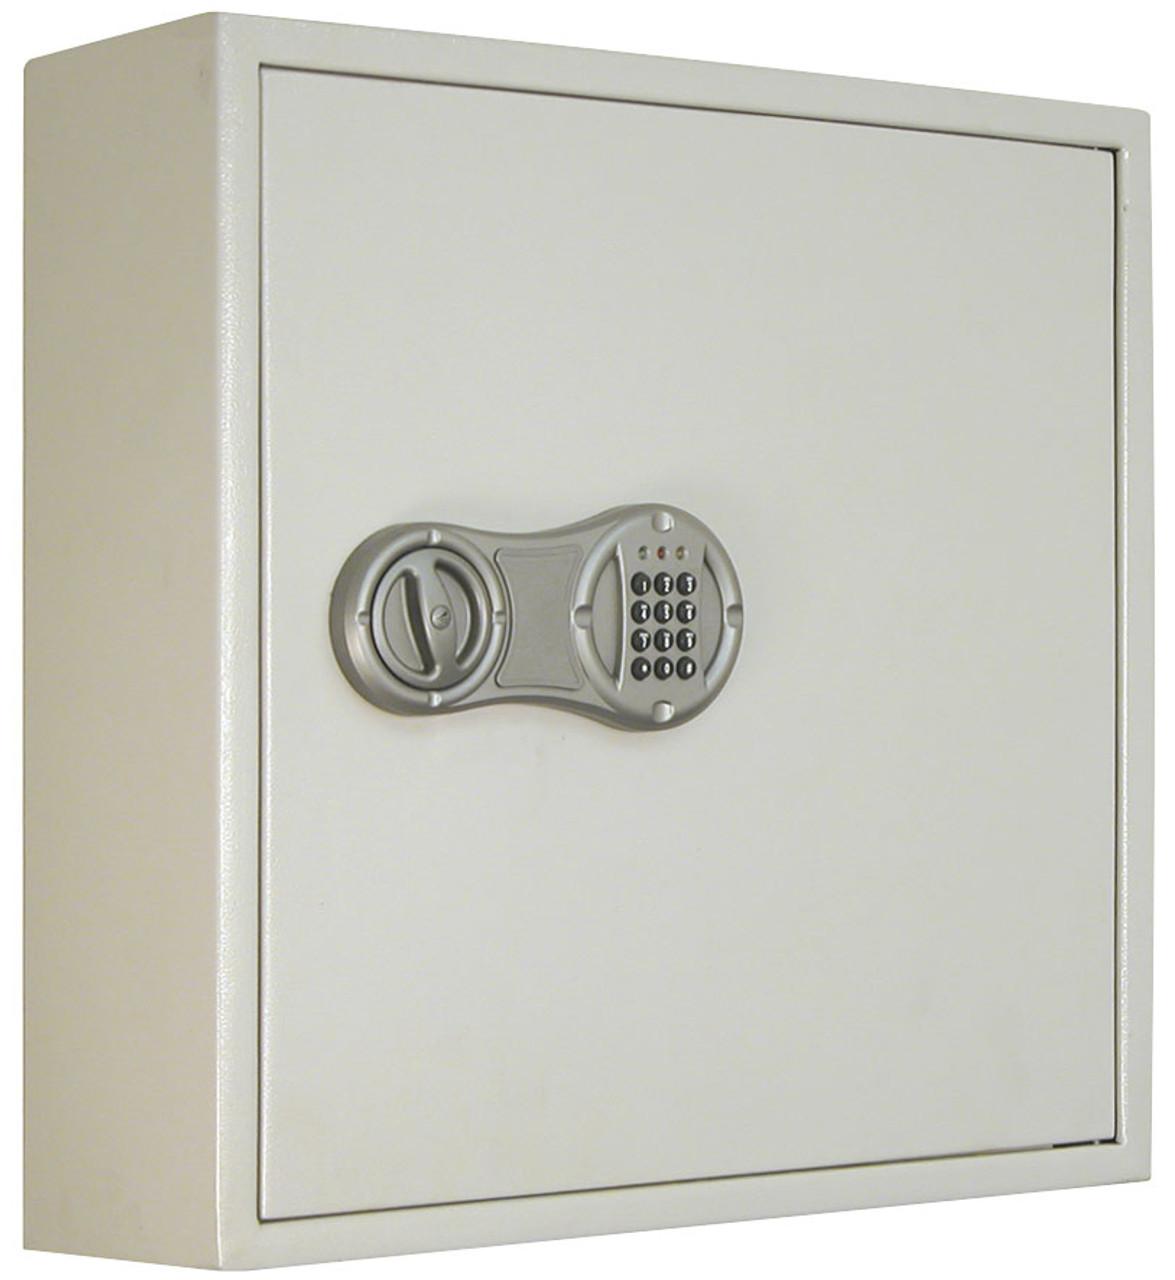 Gentil Locking Security Mailbox